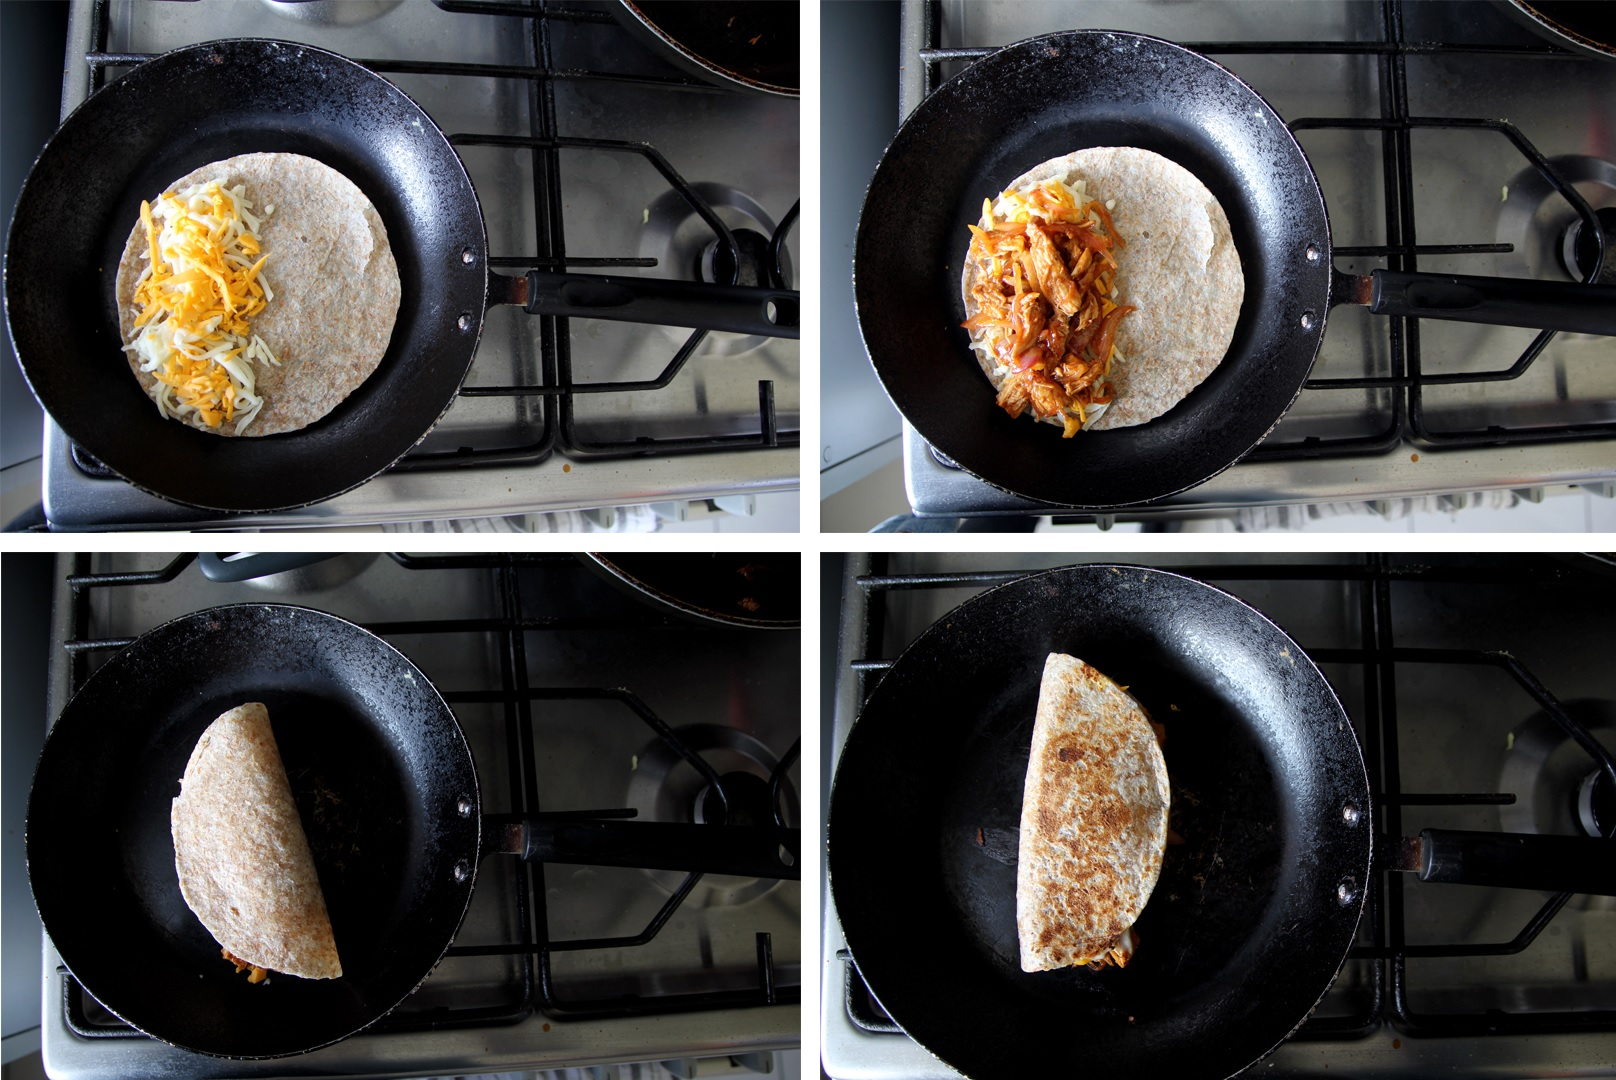 serendiity receta quesadillas 14